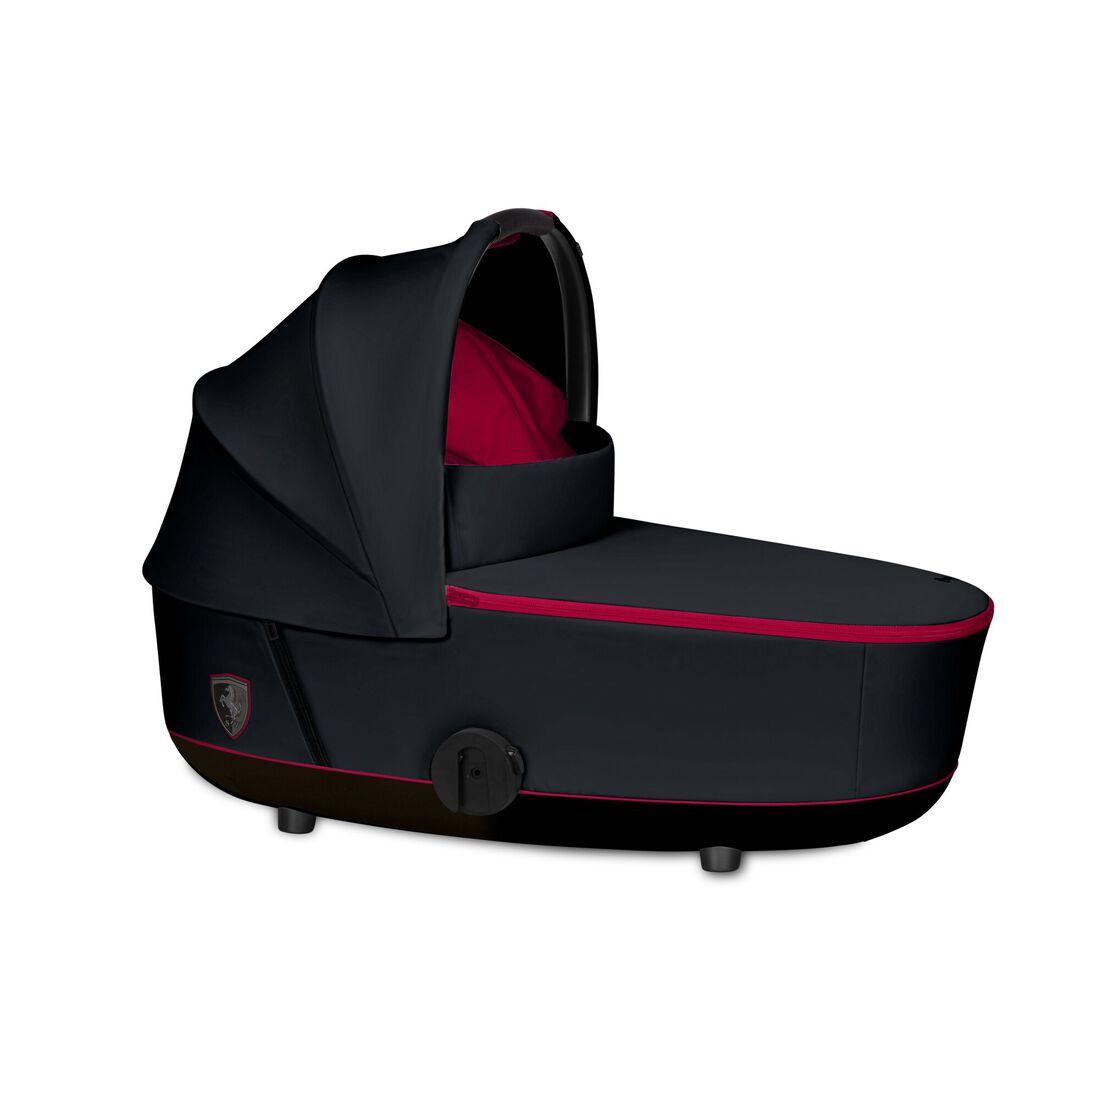 CYBEX Mios Lux Carry Cot - Ferrari Victory Black in Ferrari Victory Black large image number 1